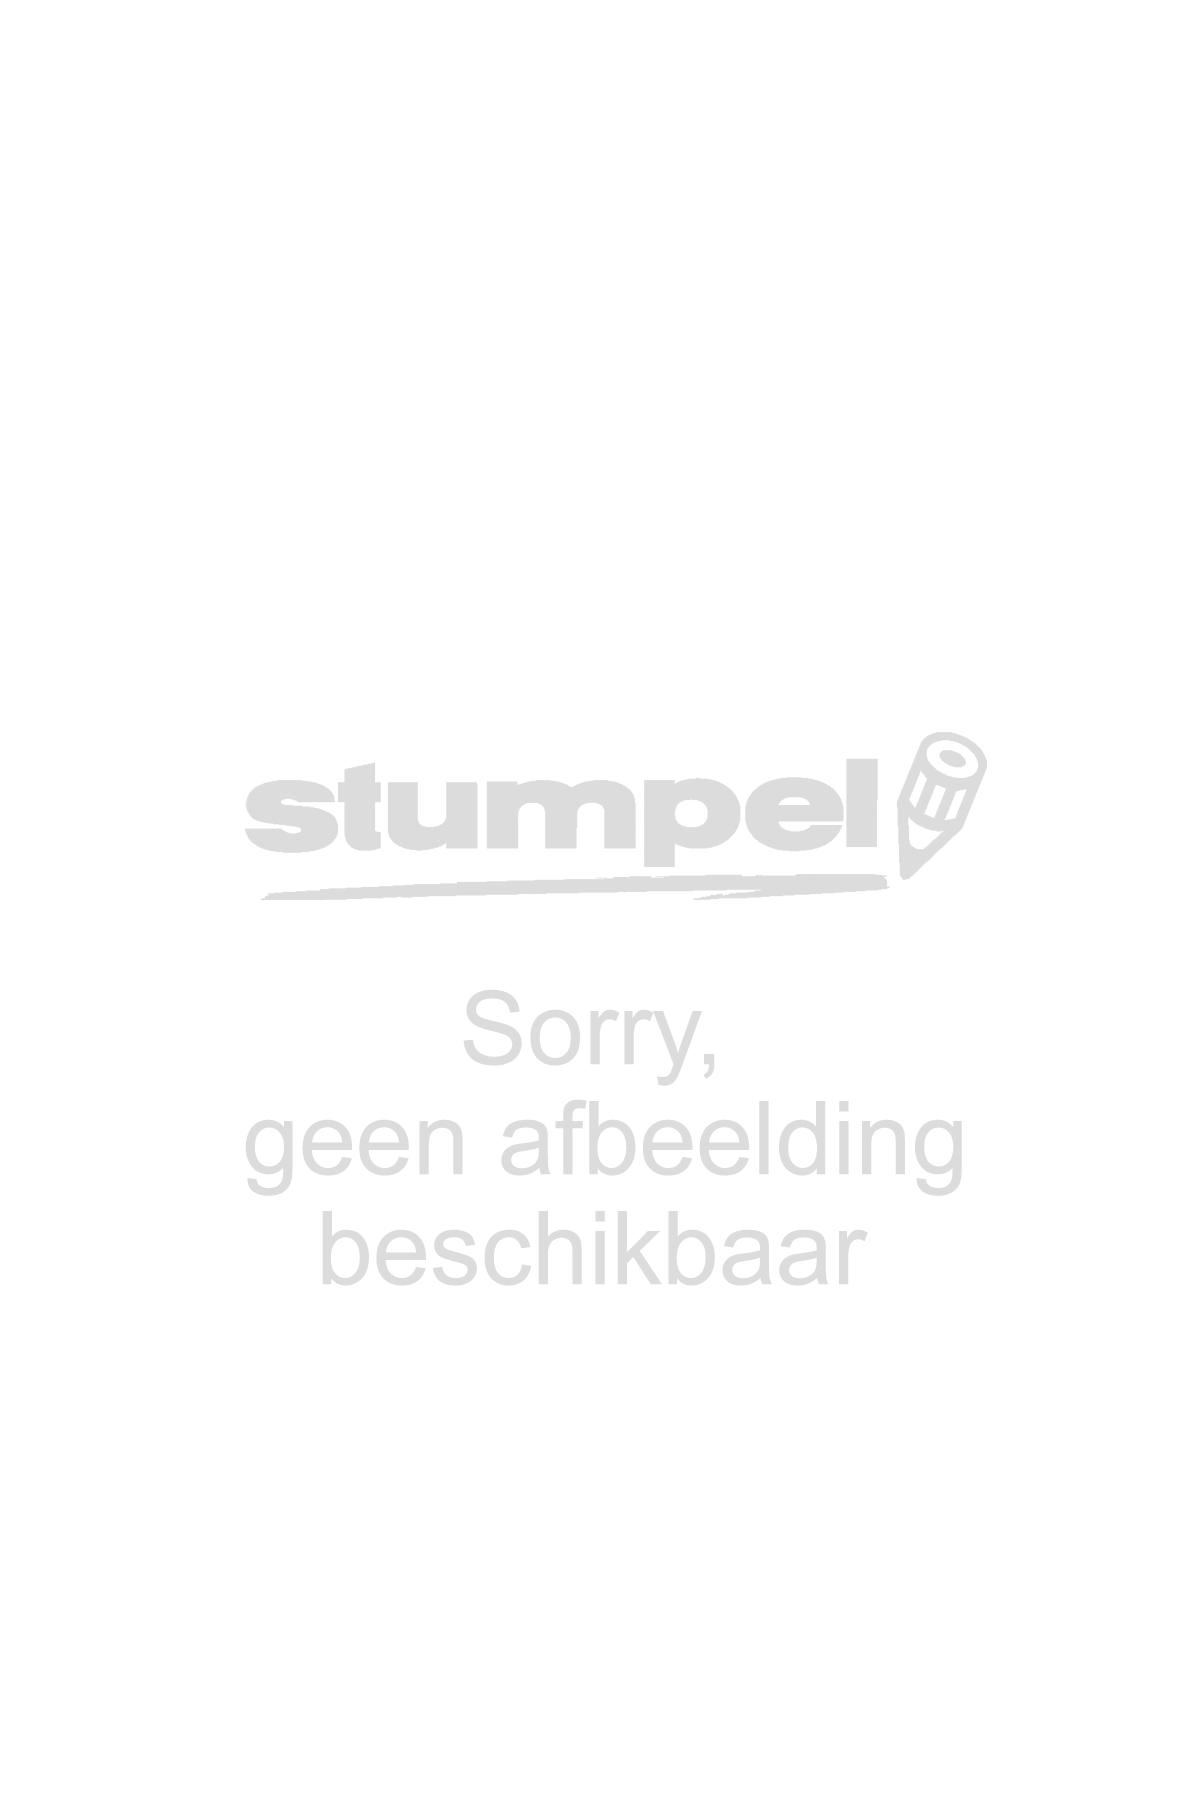 Stormparaplu SENZ Original Royal Delft